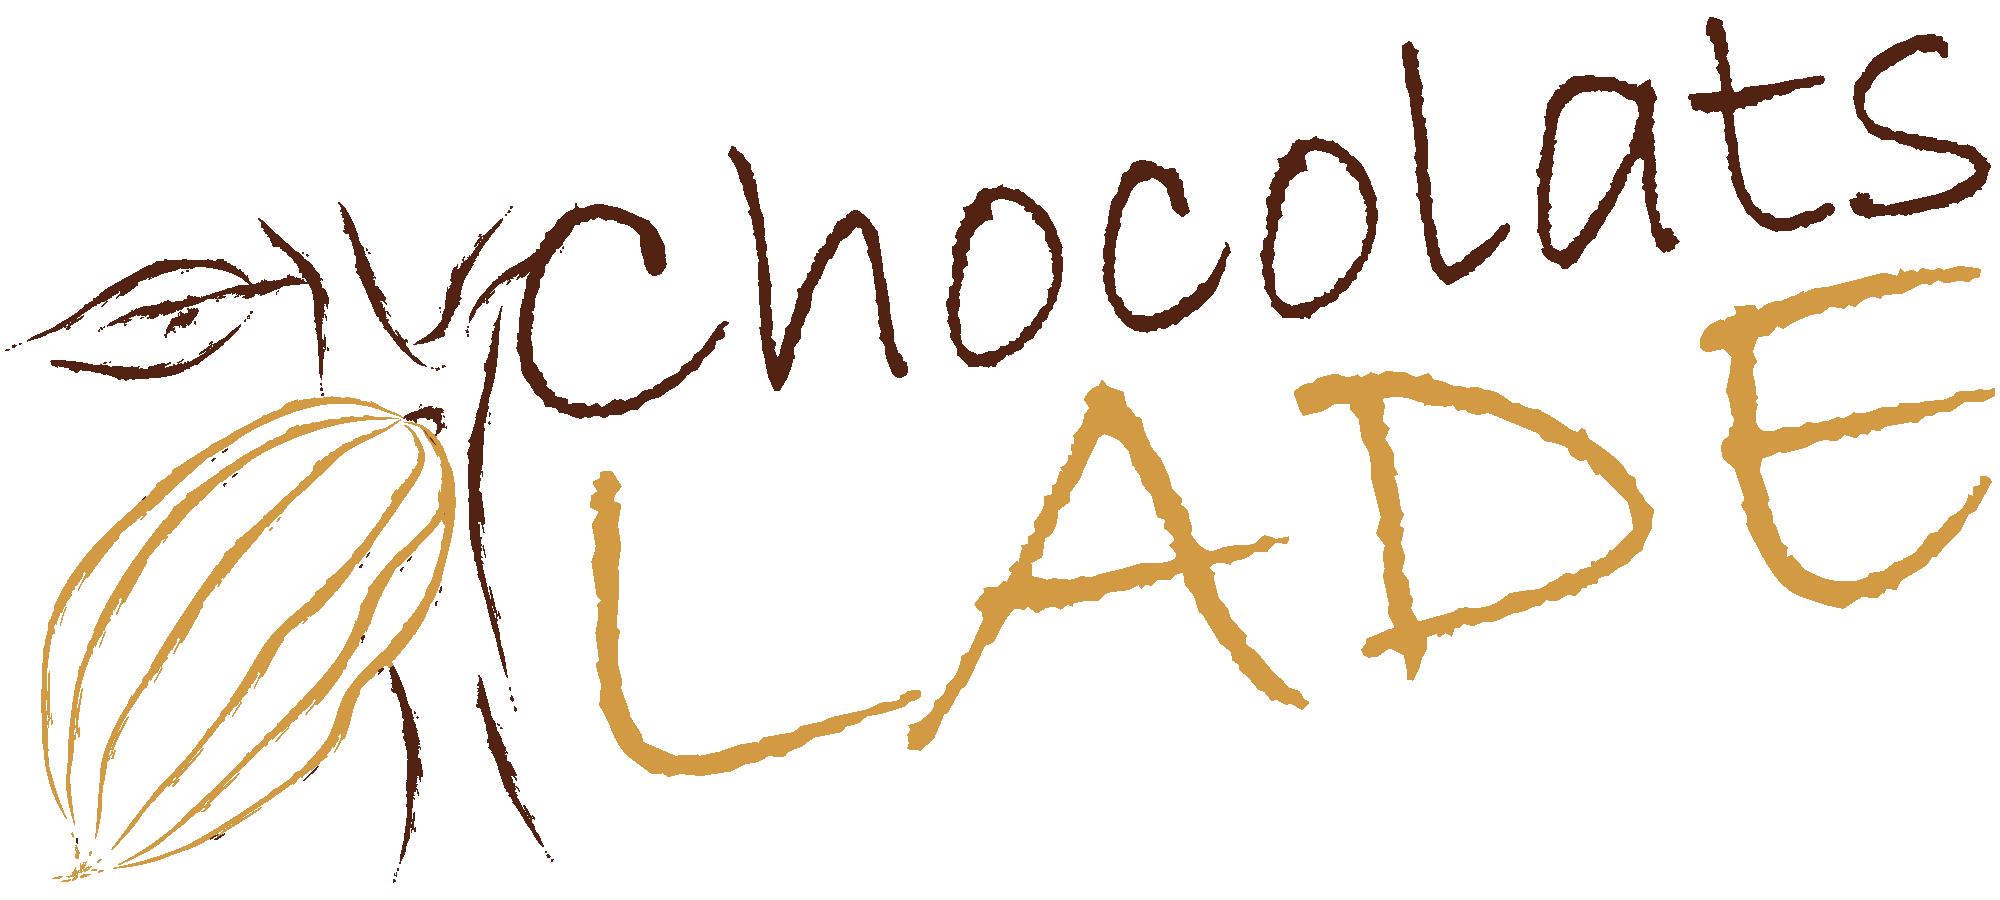 ChocolatsLade